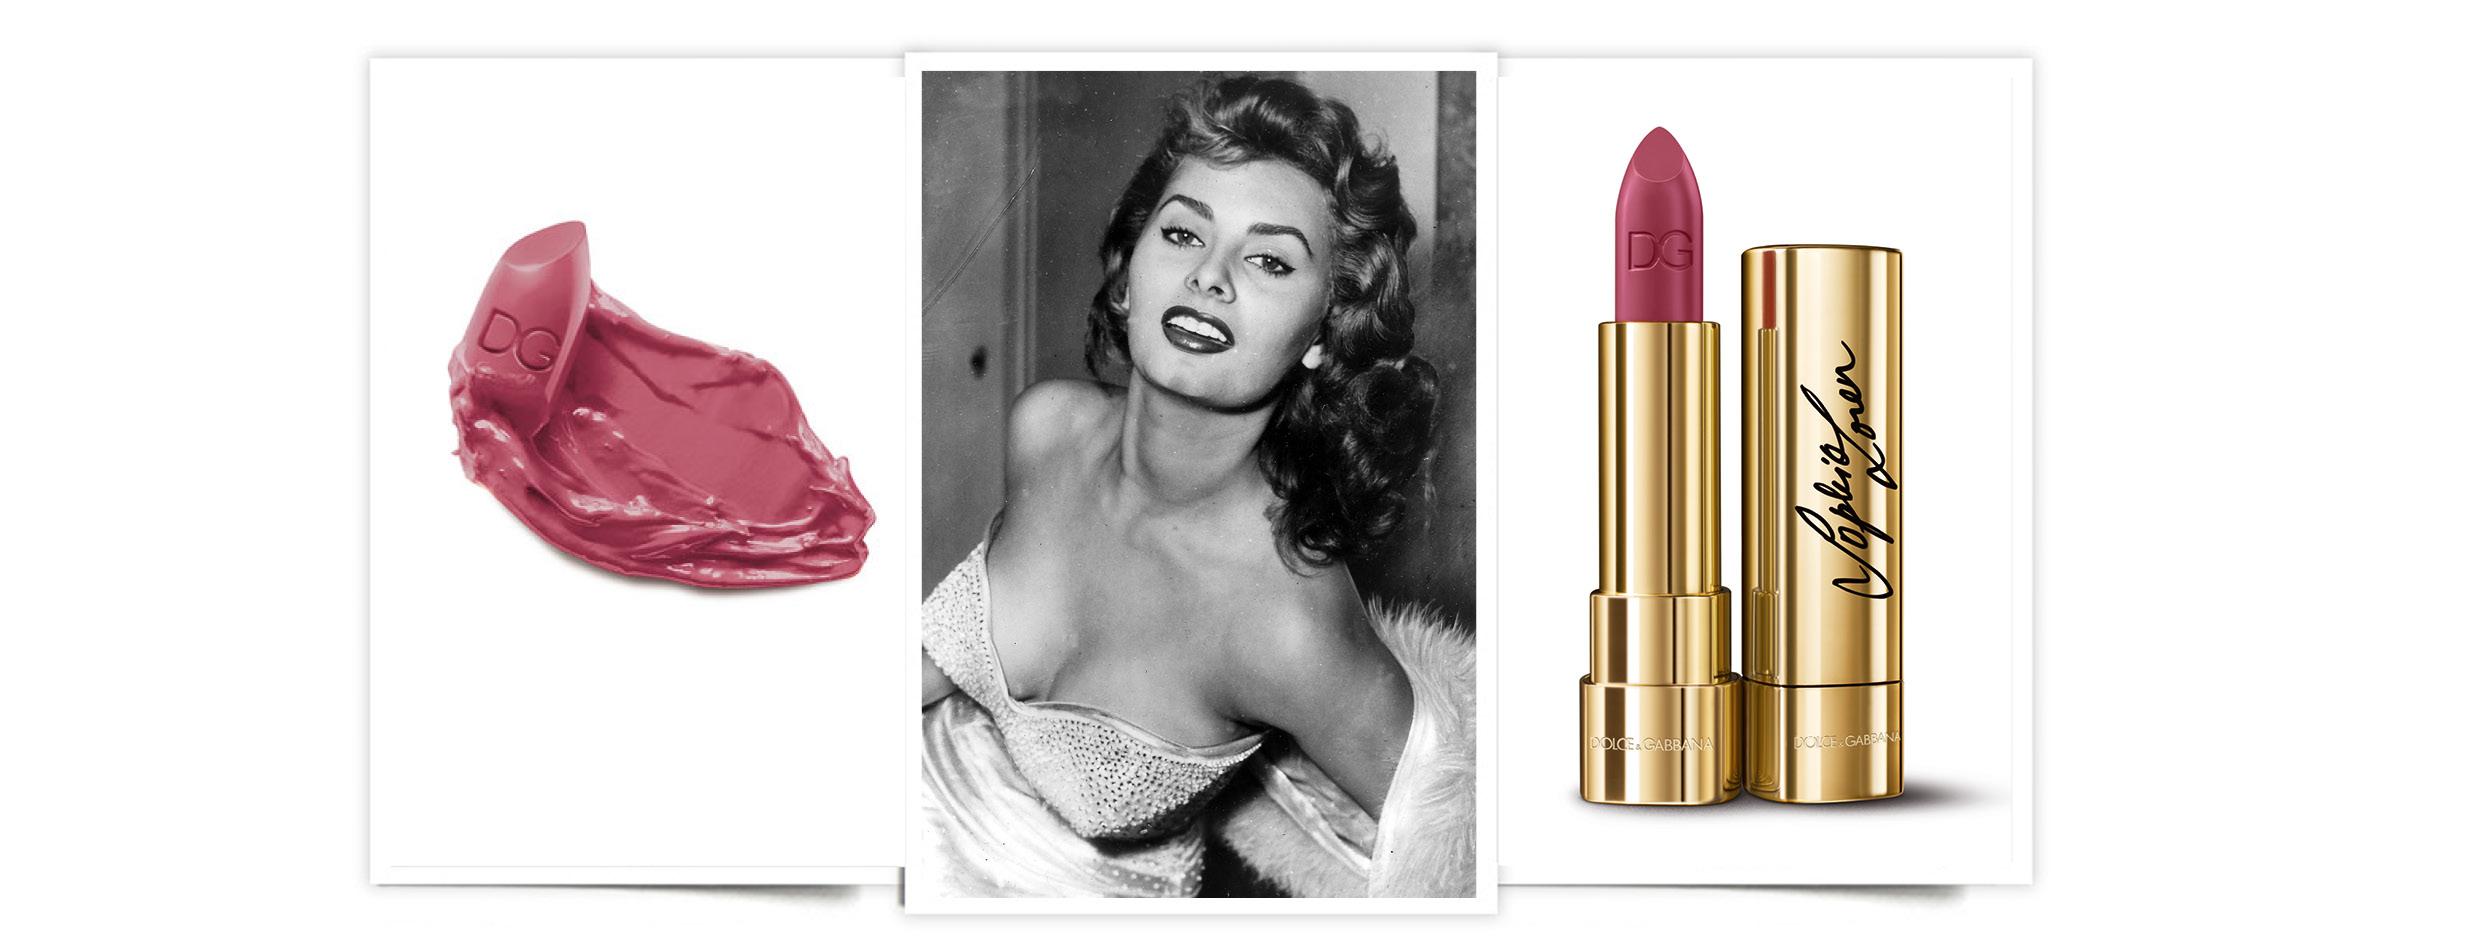 D&G Sophia Loren